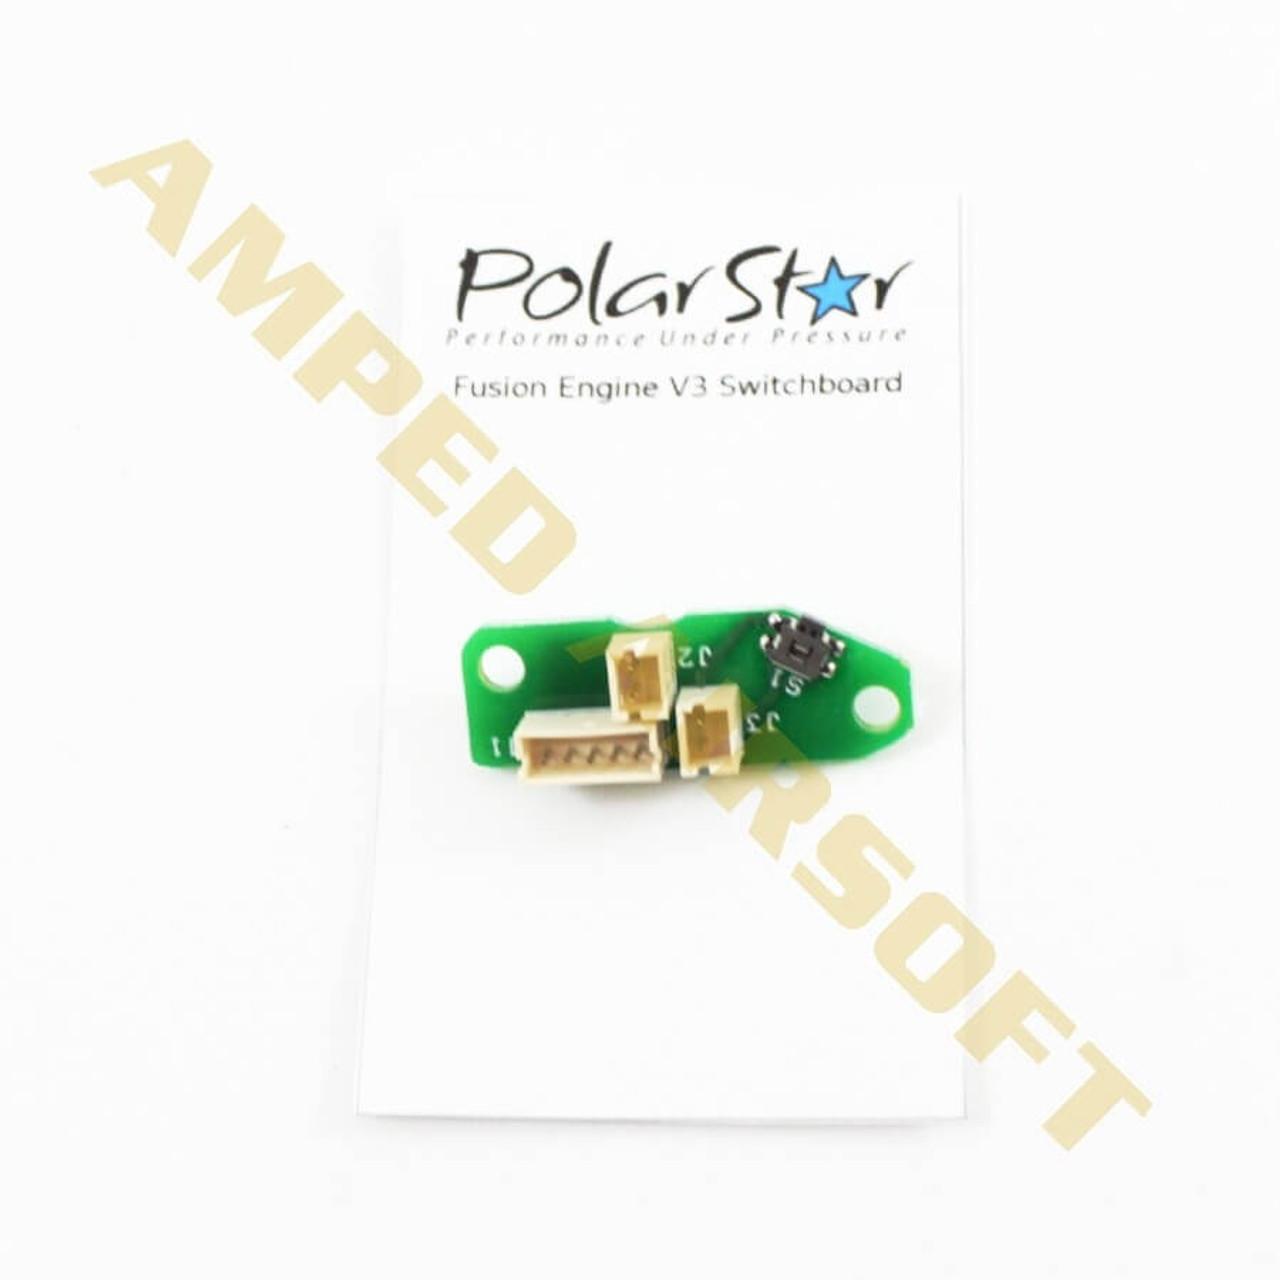 Polarstar Fusion Engine V2 Gen2 Terrariumtvshows Mini Circuit Board Replacing V3 Fe Trigger Bingo Airsoftworks